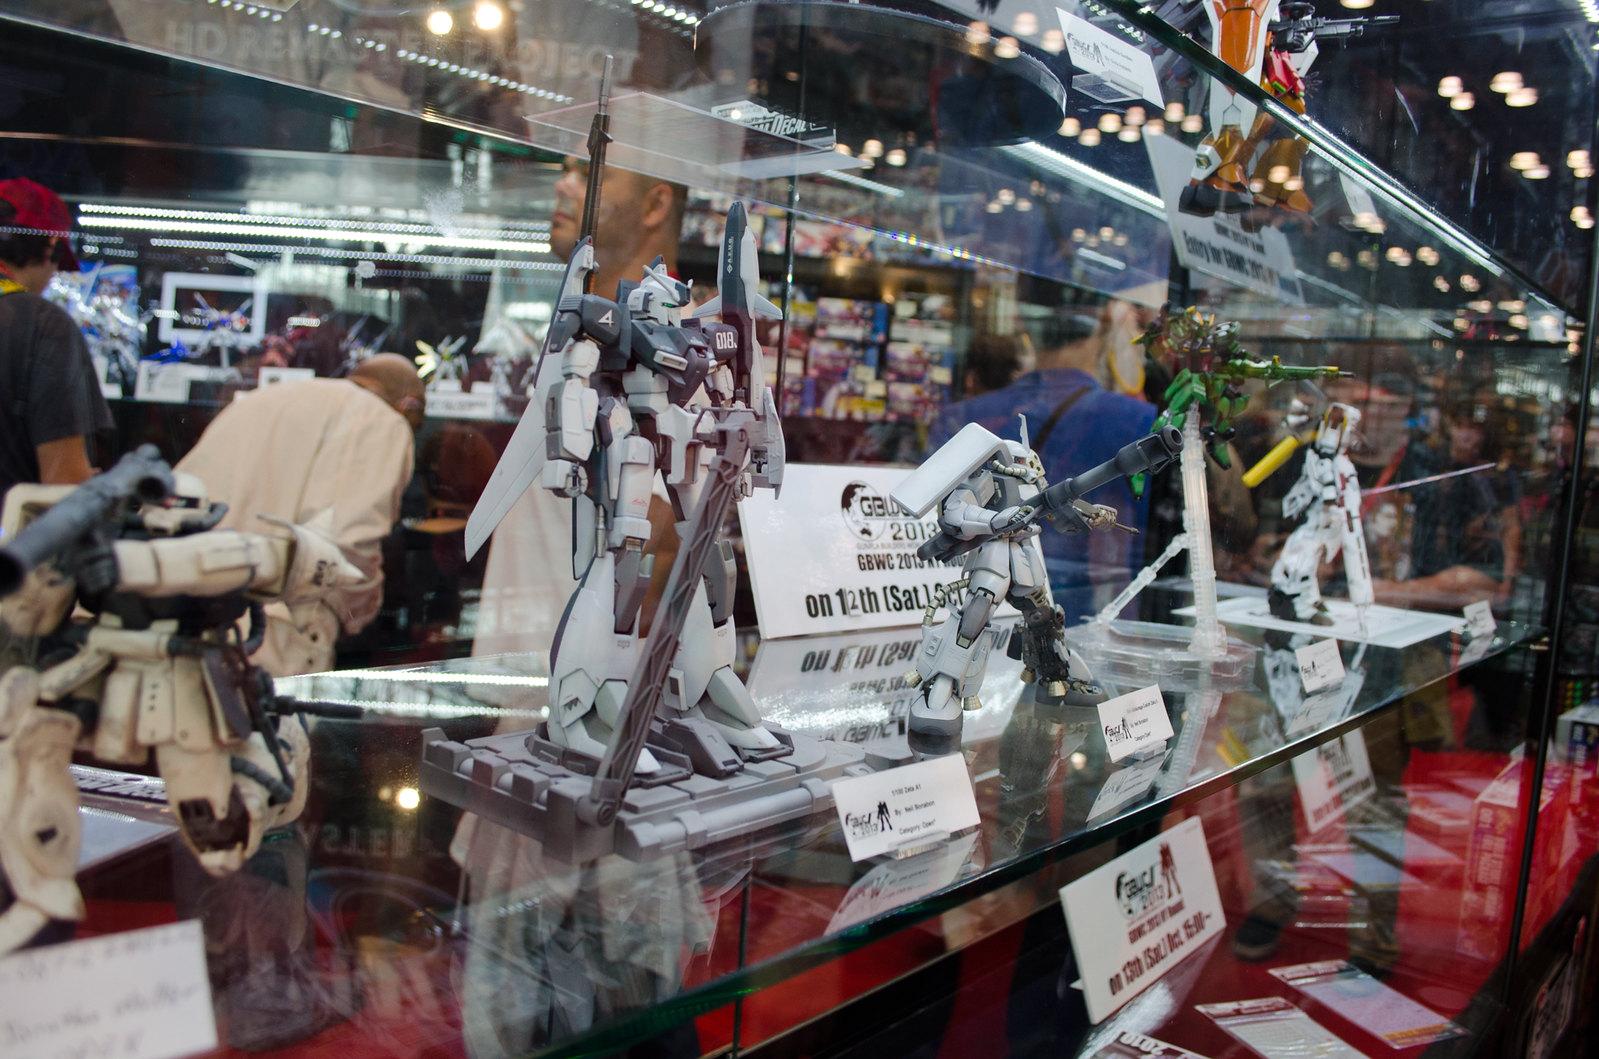 NYCC Gundam Kits